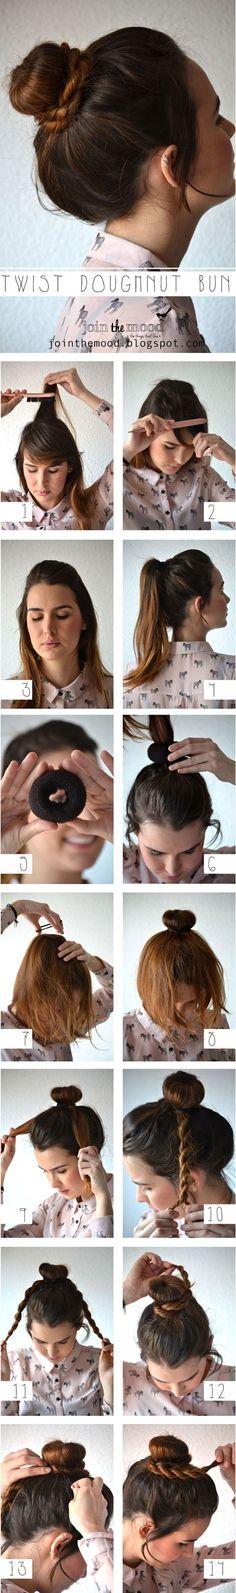 Twist Doughnut Bun